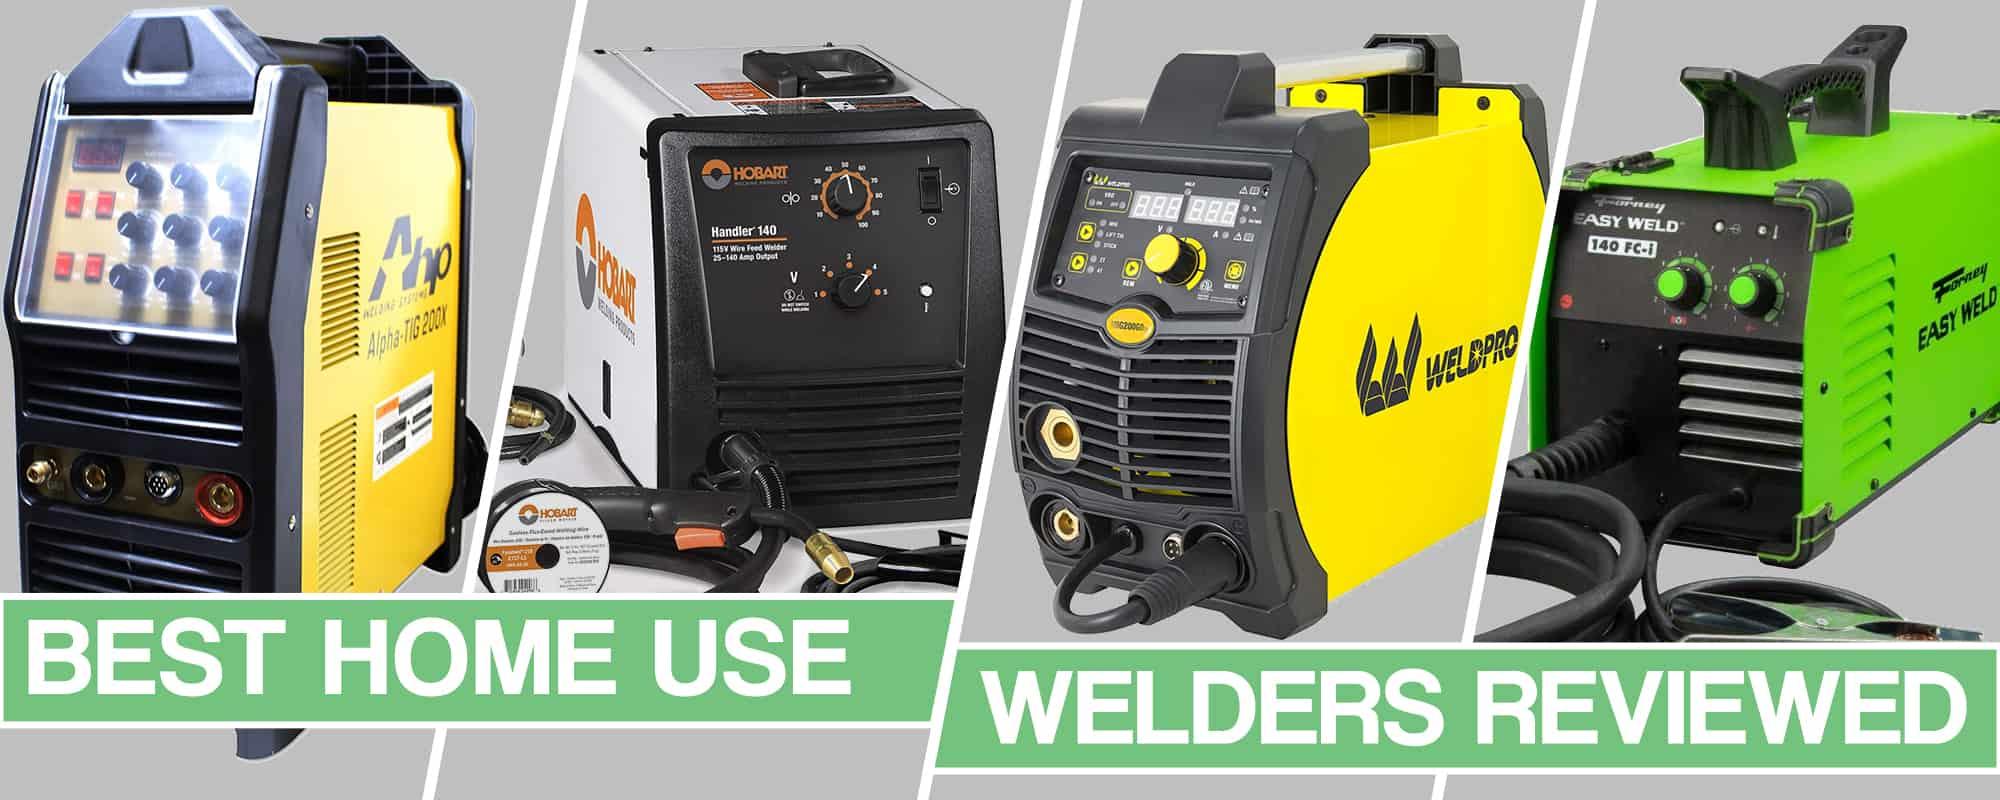 image of best home use welders